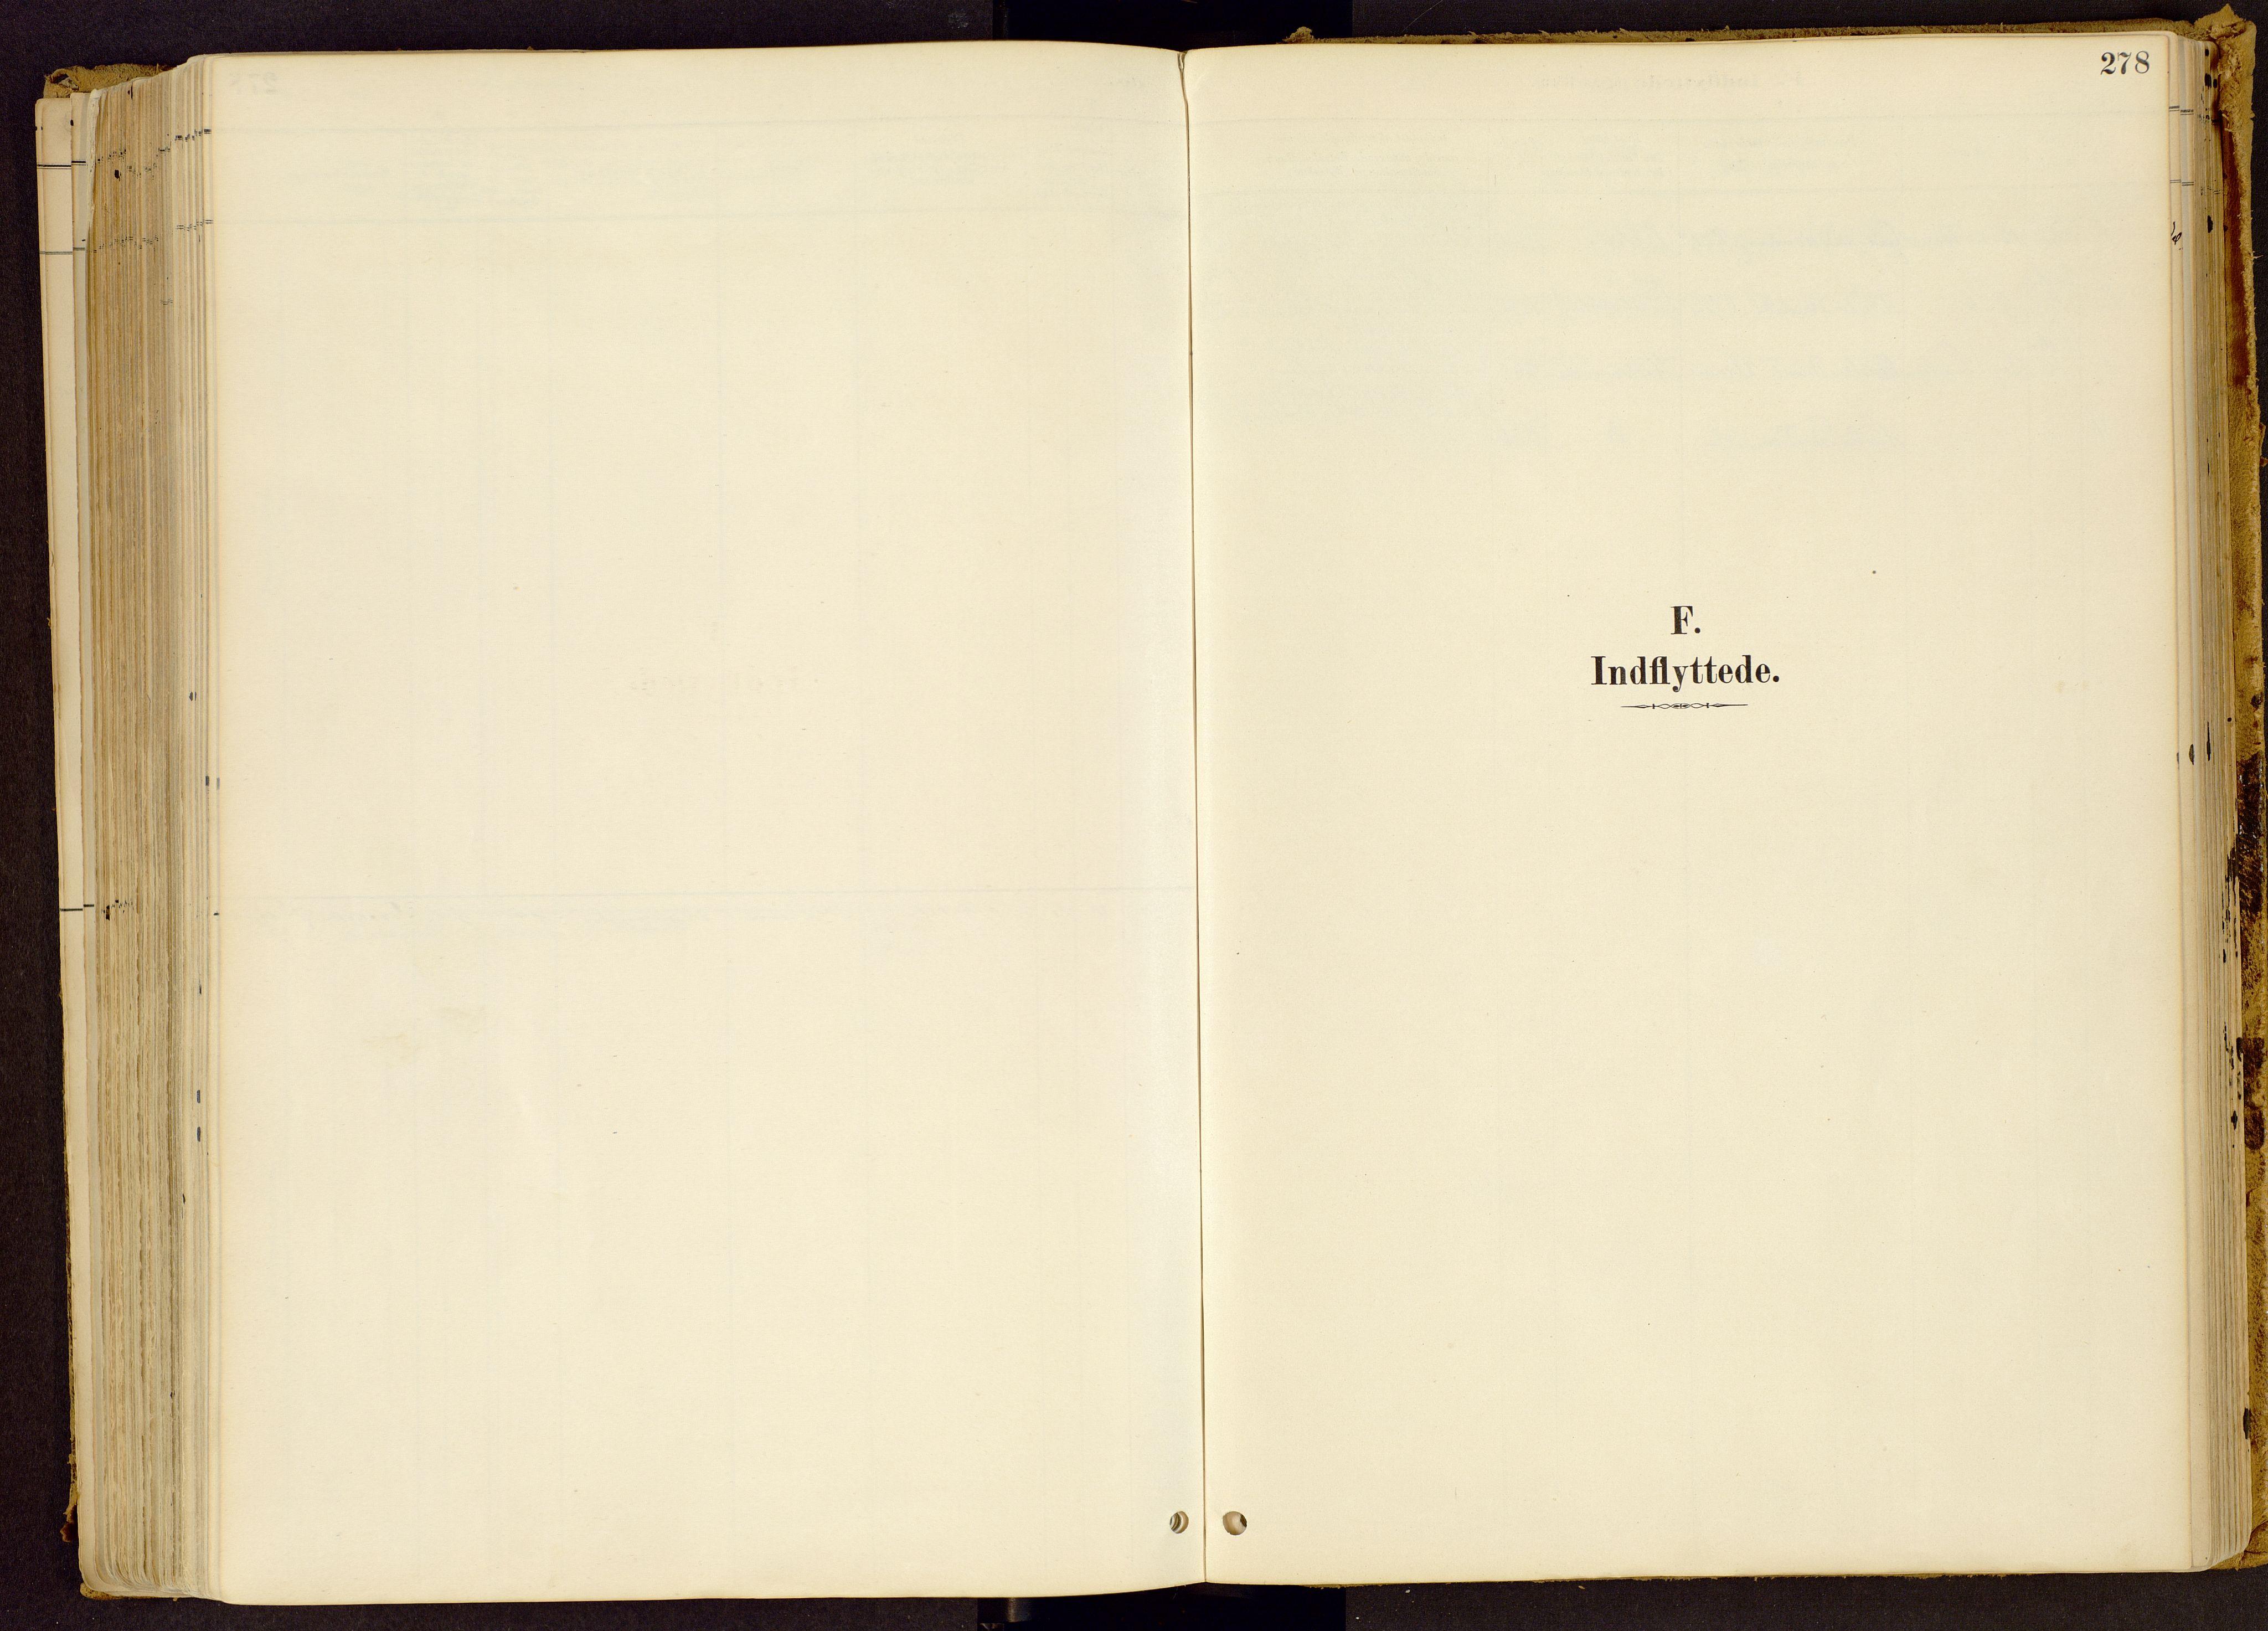 SAH, Vestre Gausdal prestekontor, Ministerialbok nr. 1, 1887-1914, s. 278